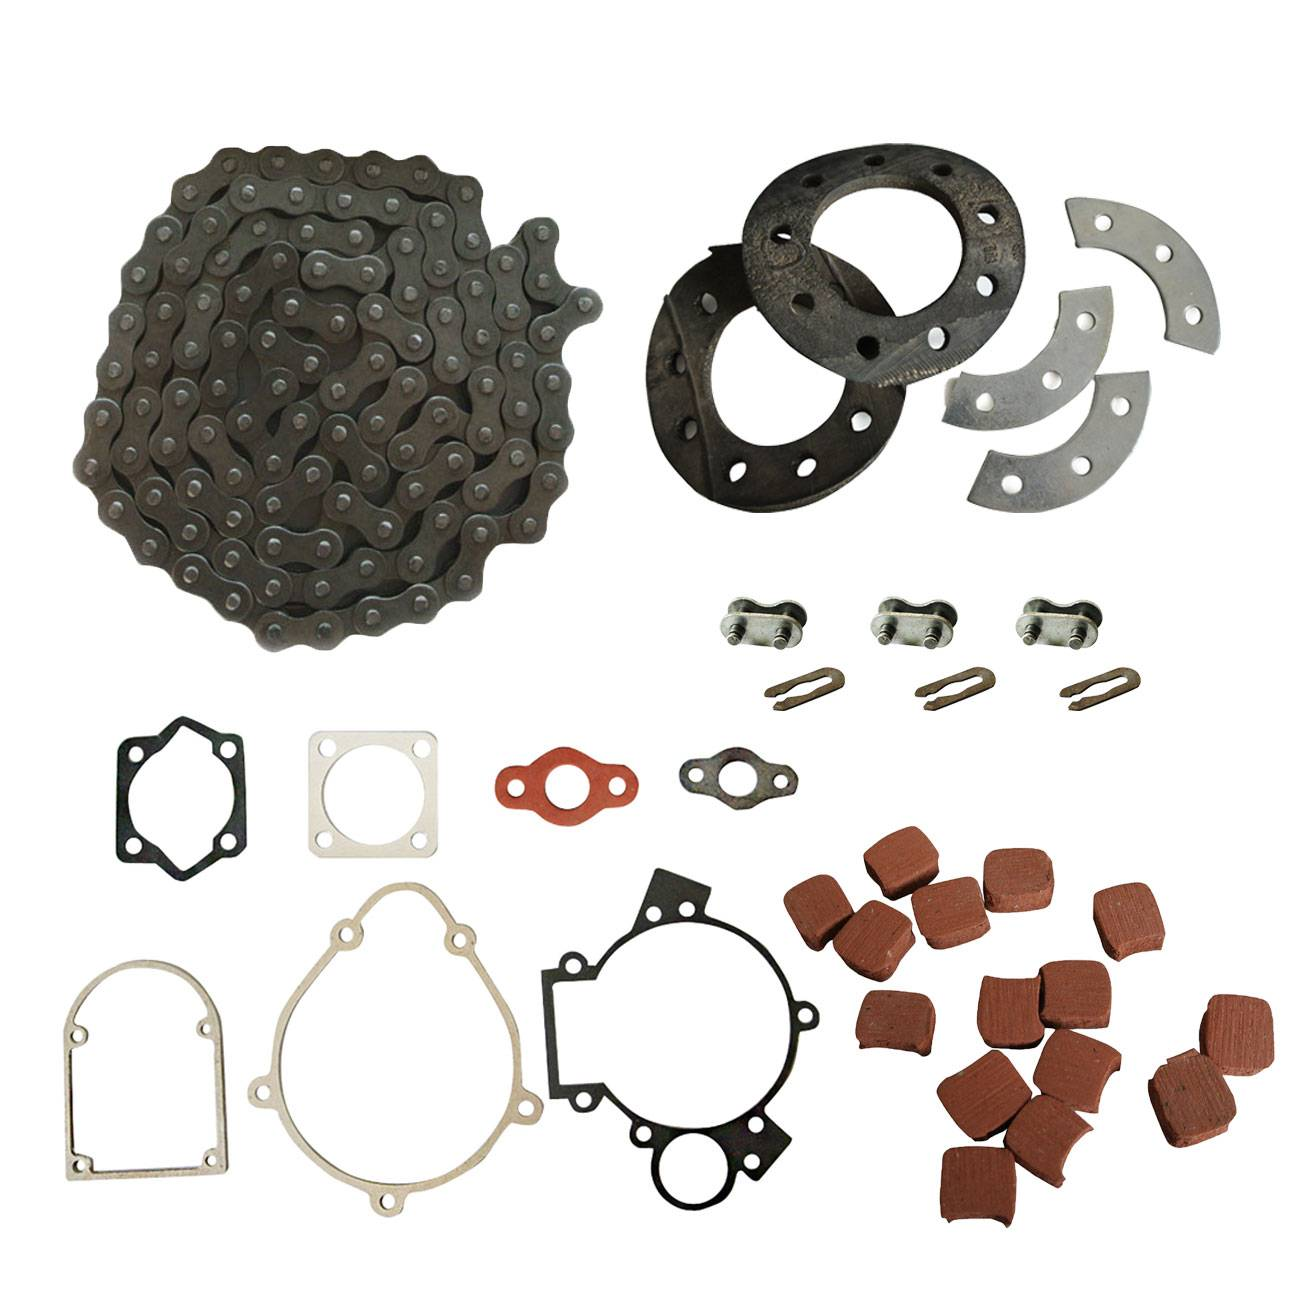 415 Chain&Sprocket Mount Kit Fits 49 /60 /80cc 2 Stroke Engine Motorized Bicycle